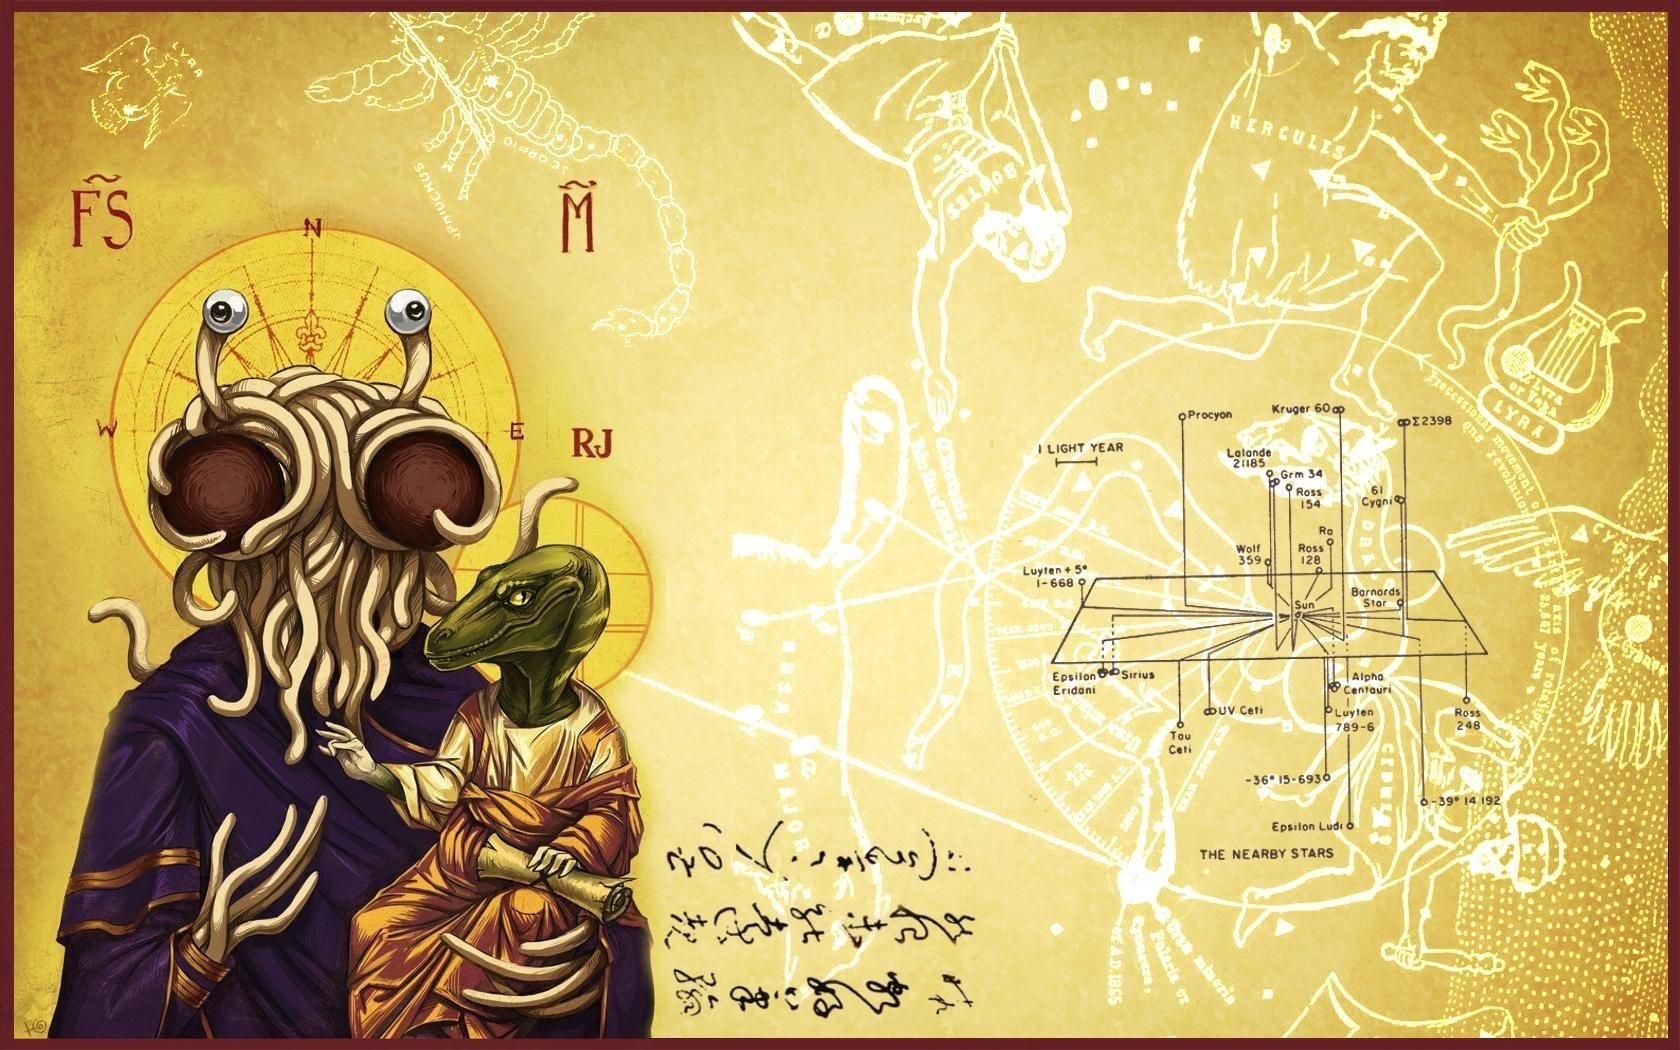 church of the flying spaghetti monster wallpaper   1680x1050   id